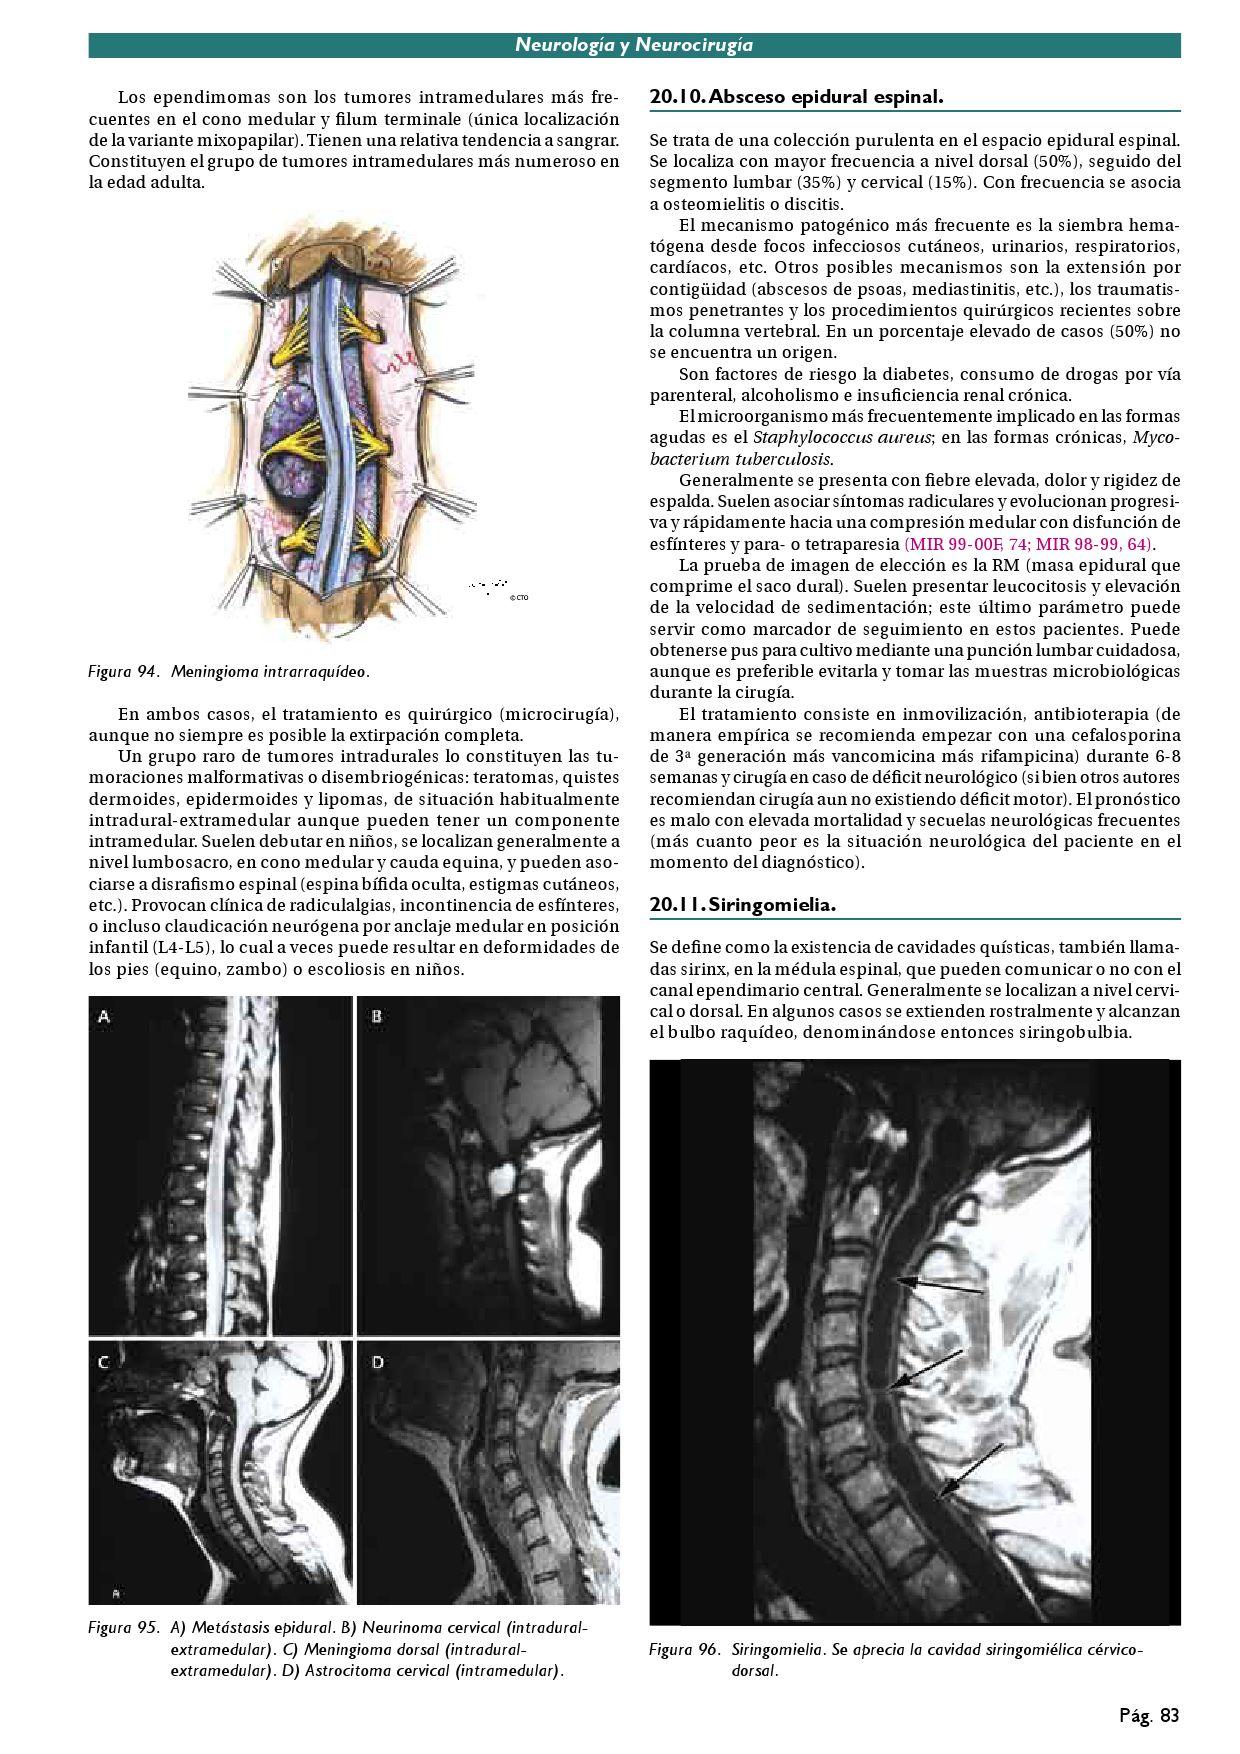 Cto Neurologia By Agustin Diaz Issuu Medicine portal   encyclopedia   gray's anatomy   topics   diseases   drugs   wellness   obesity. cto neurologia by agustin diaz issuu